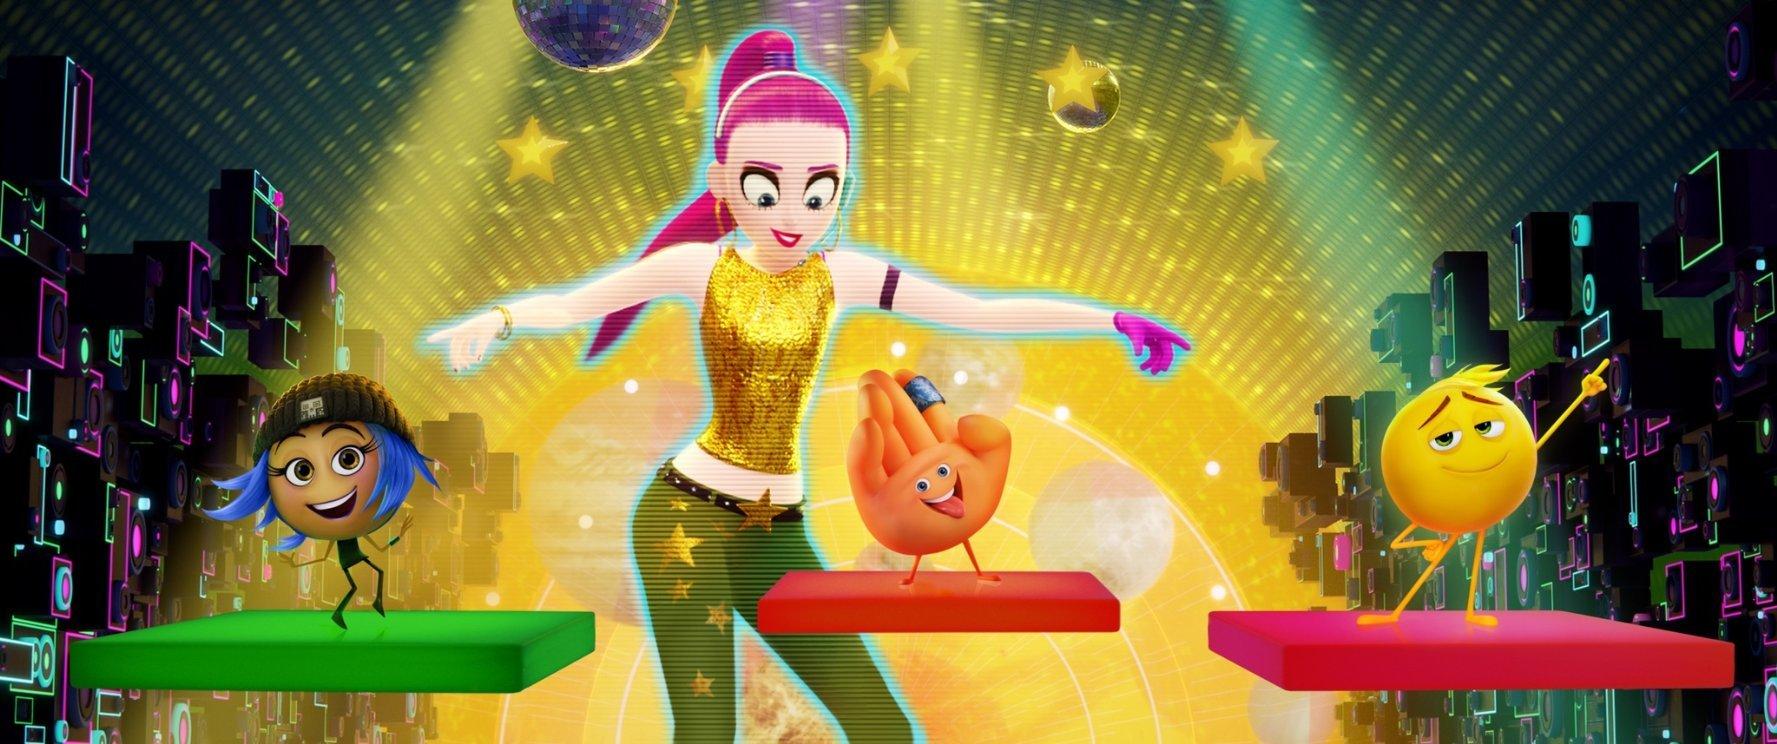 The Emoji Movie Trailer Revealed